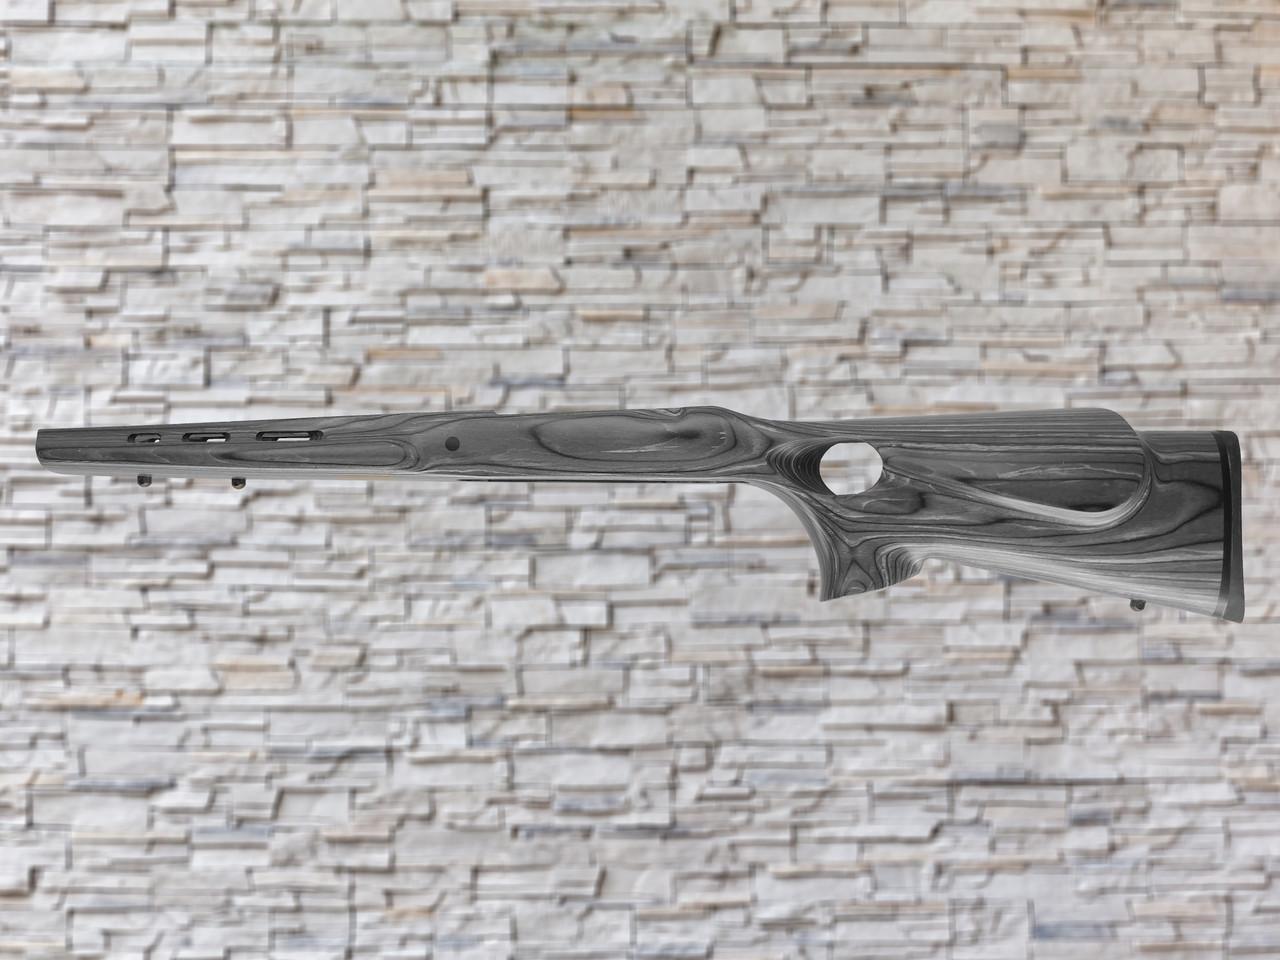 Boyds Featherweight Pepper Wood Stock for Tikka T3/T3X/T3 Lite Bull Barrel Rifles